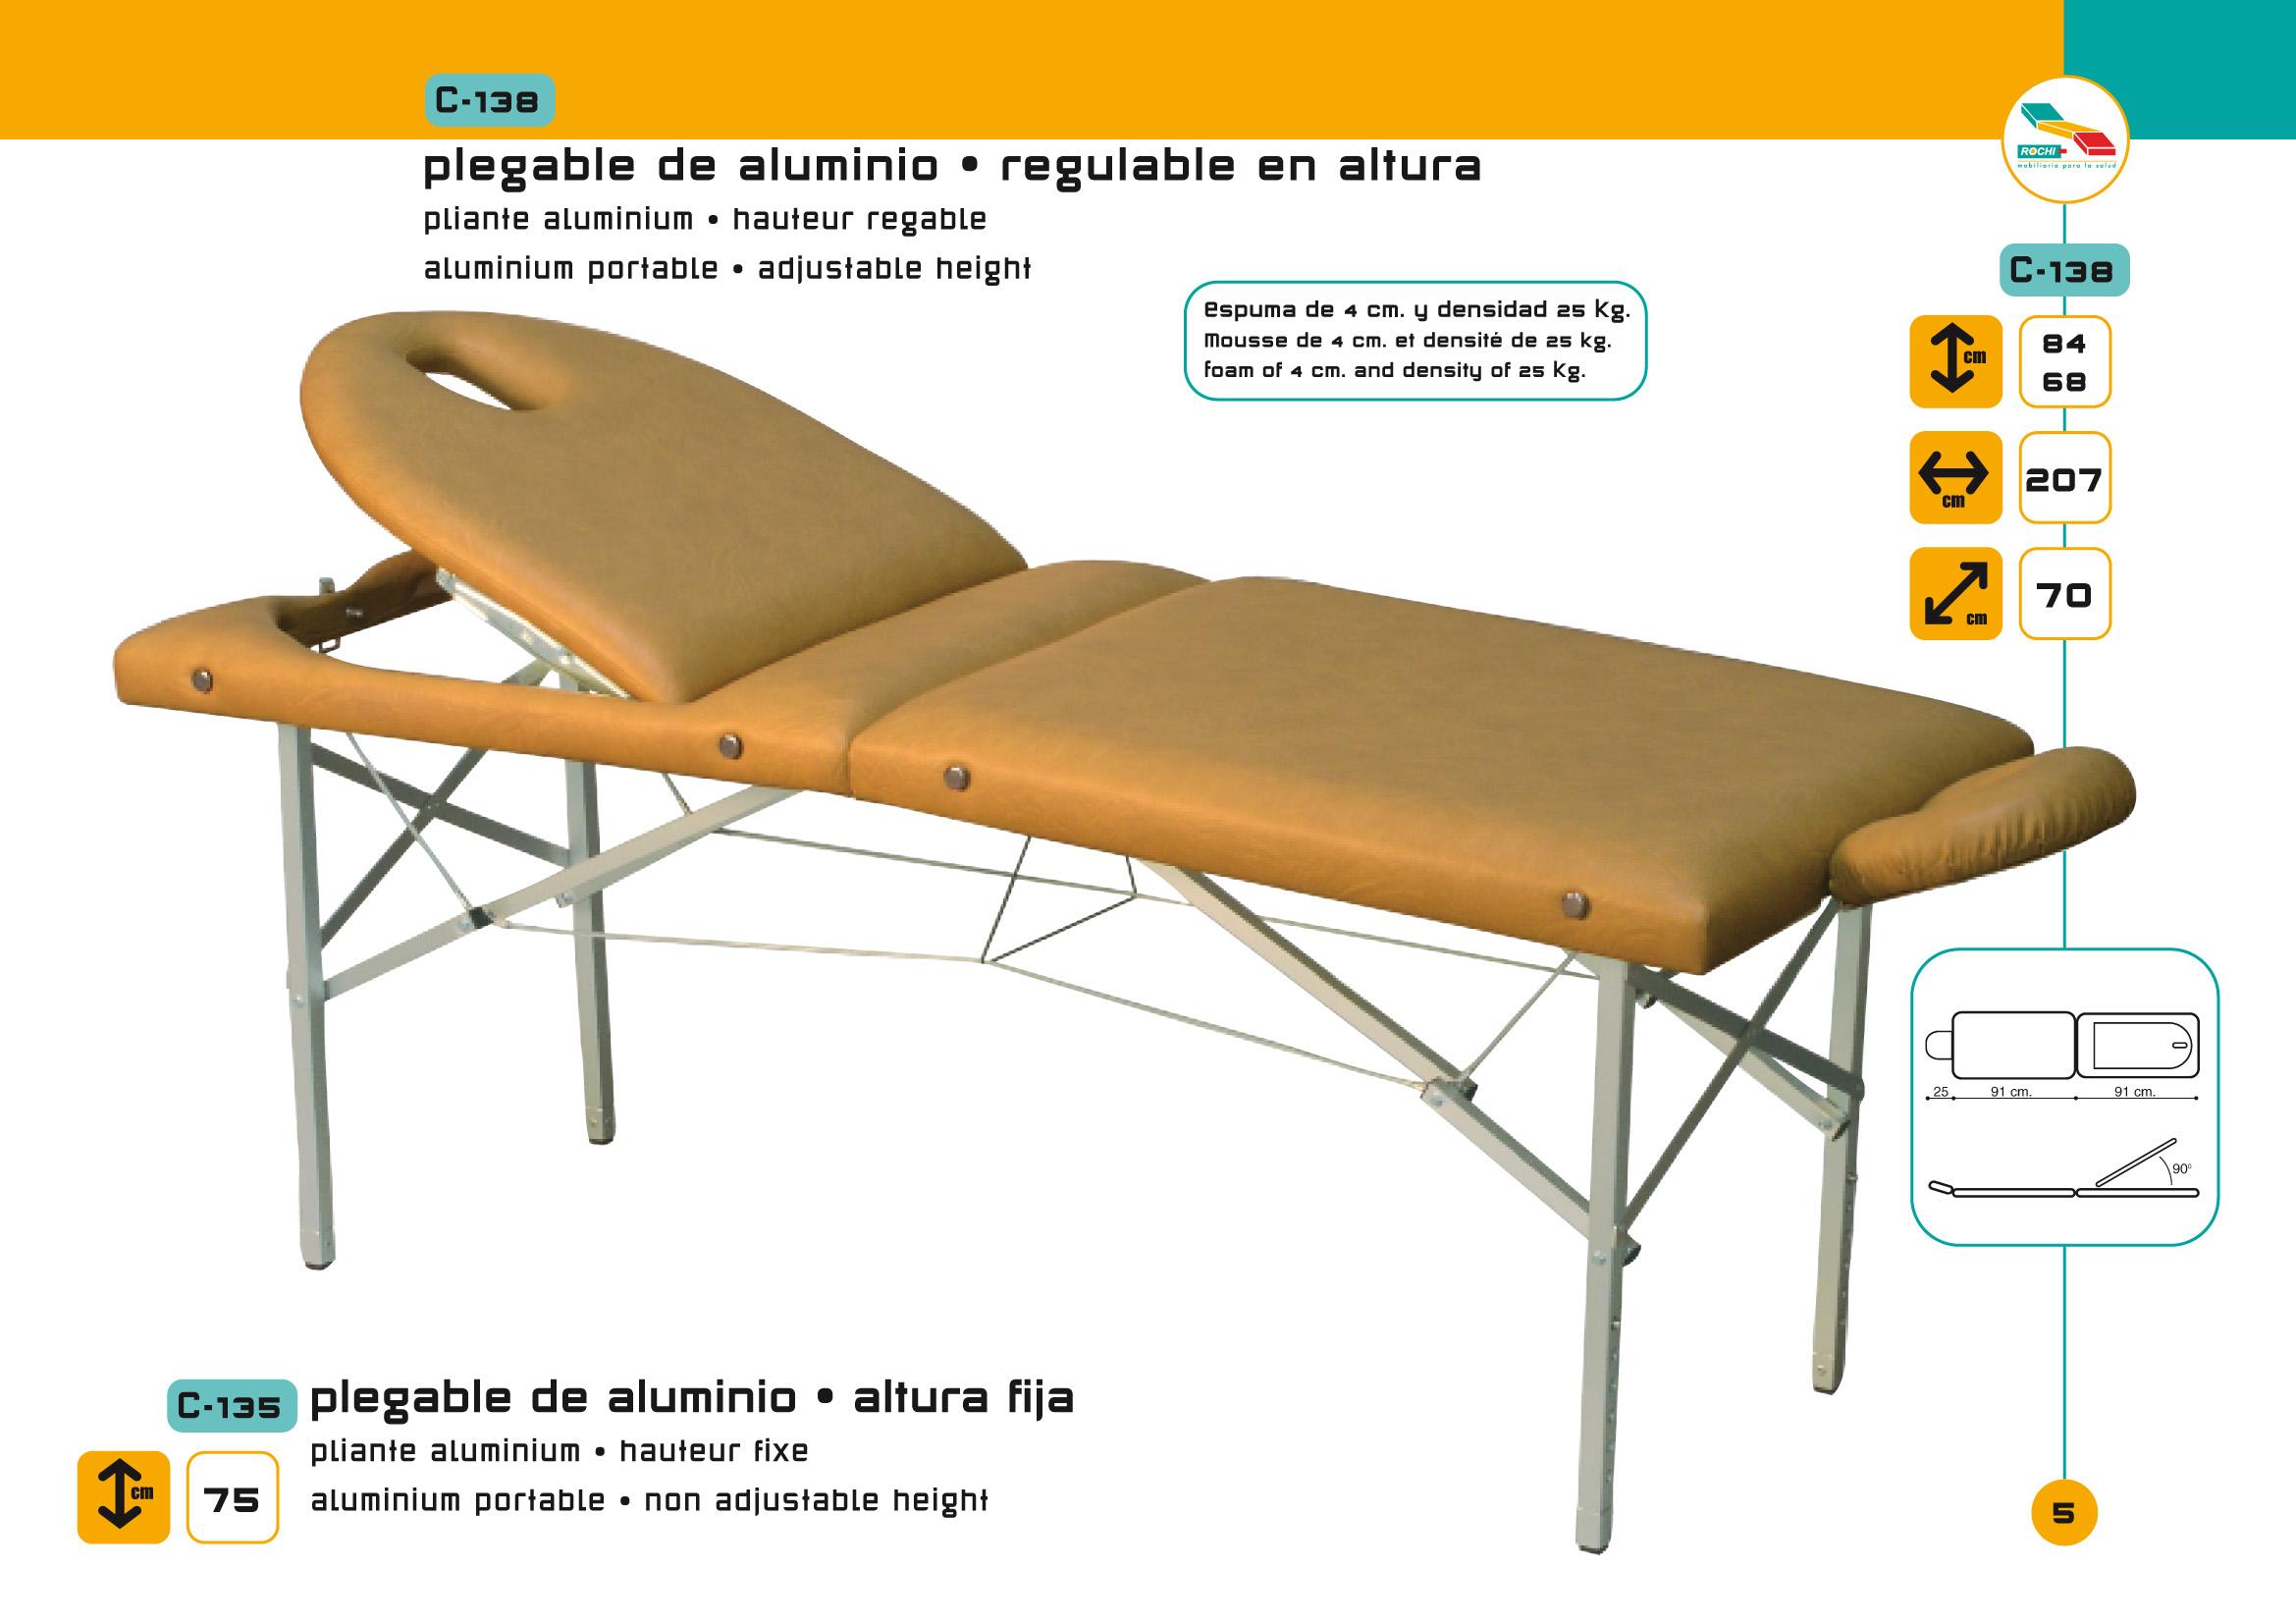 Table de massage pliante c 138 pi tement aluminium avec tendeurs - Table de massage pliante alu ...